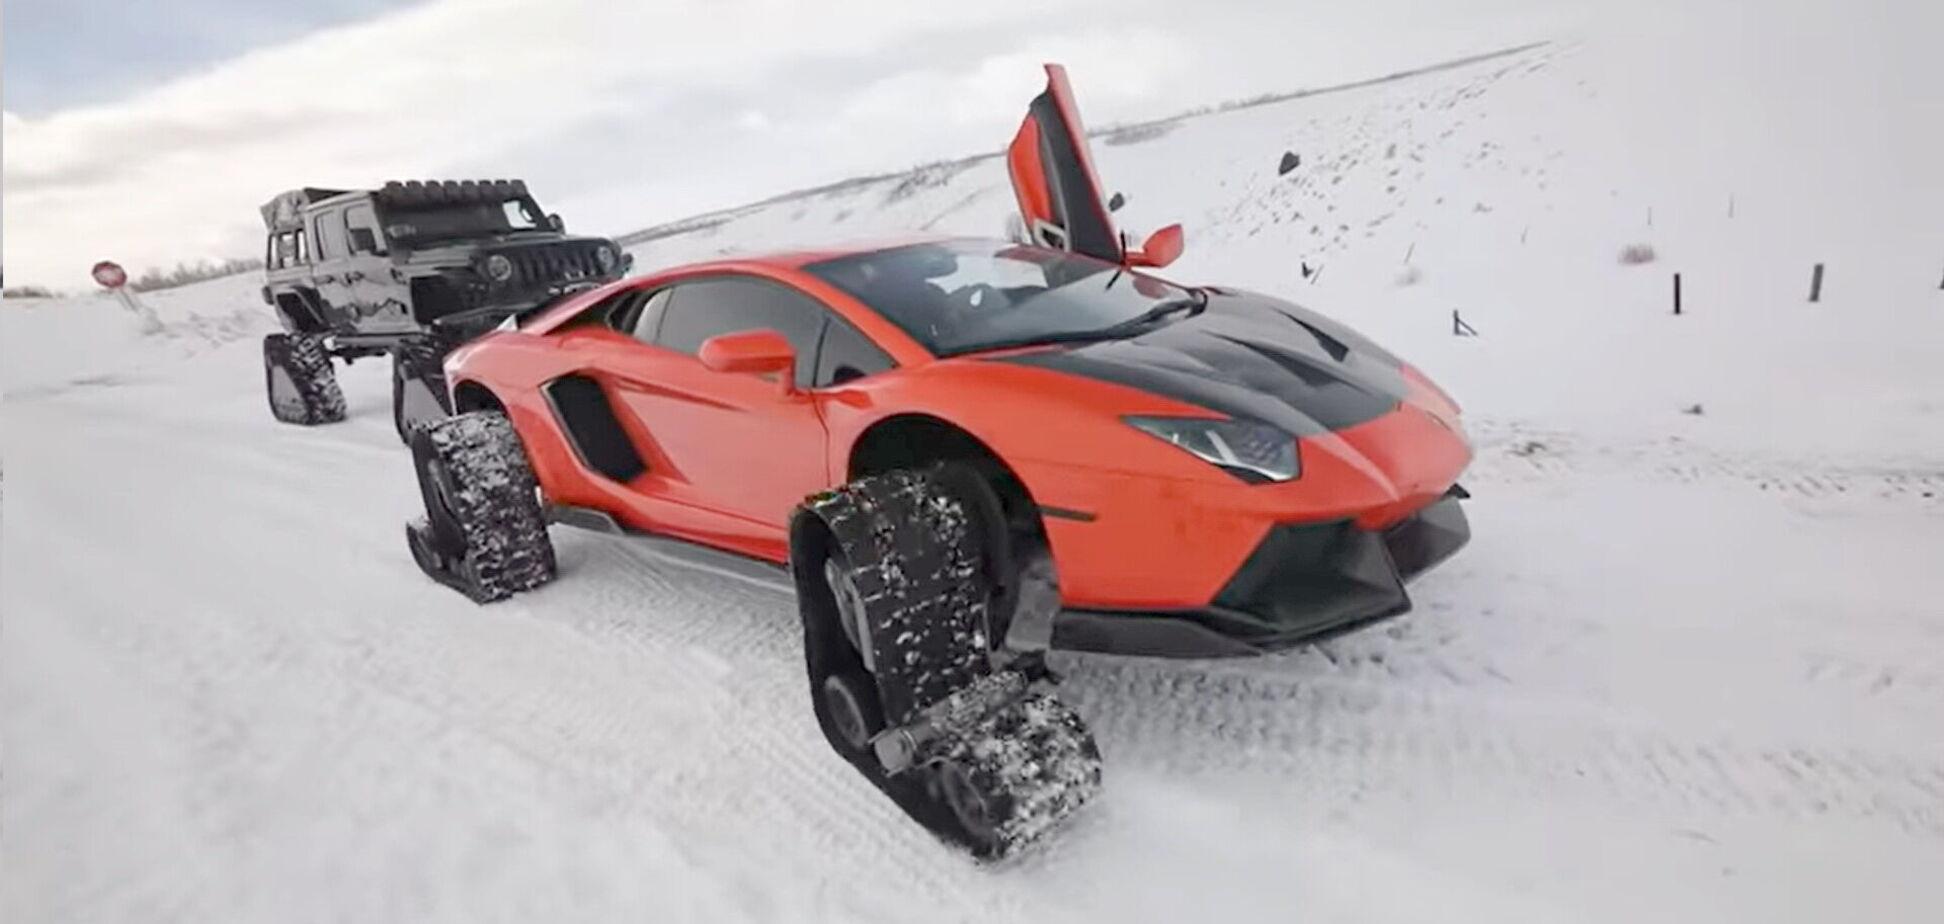 Lamborghini поставили на гусеницы и сняли на видео